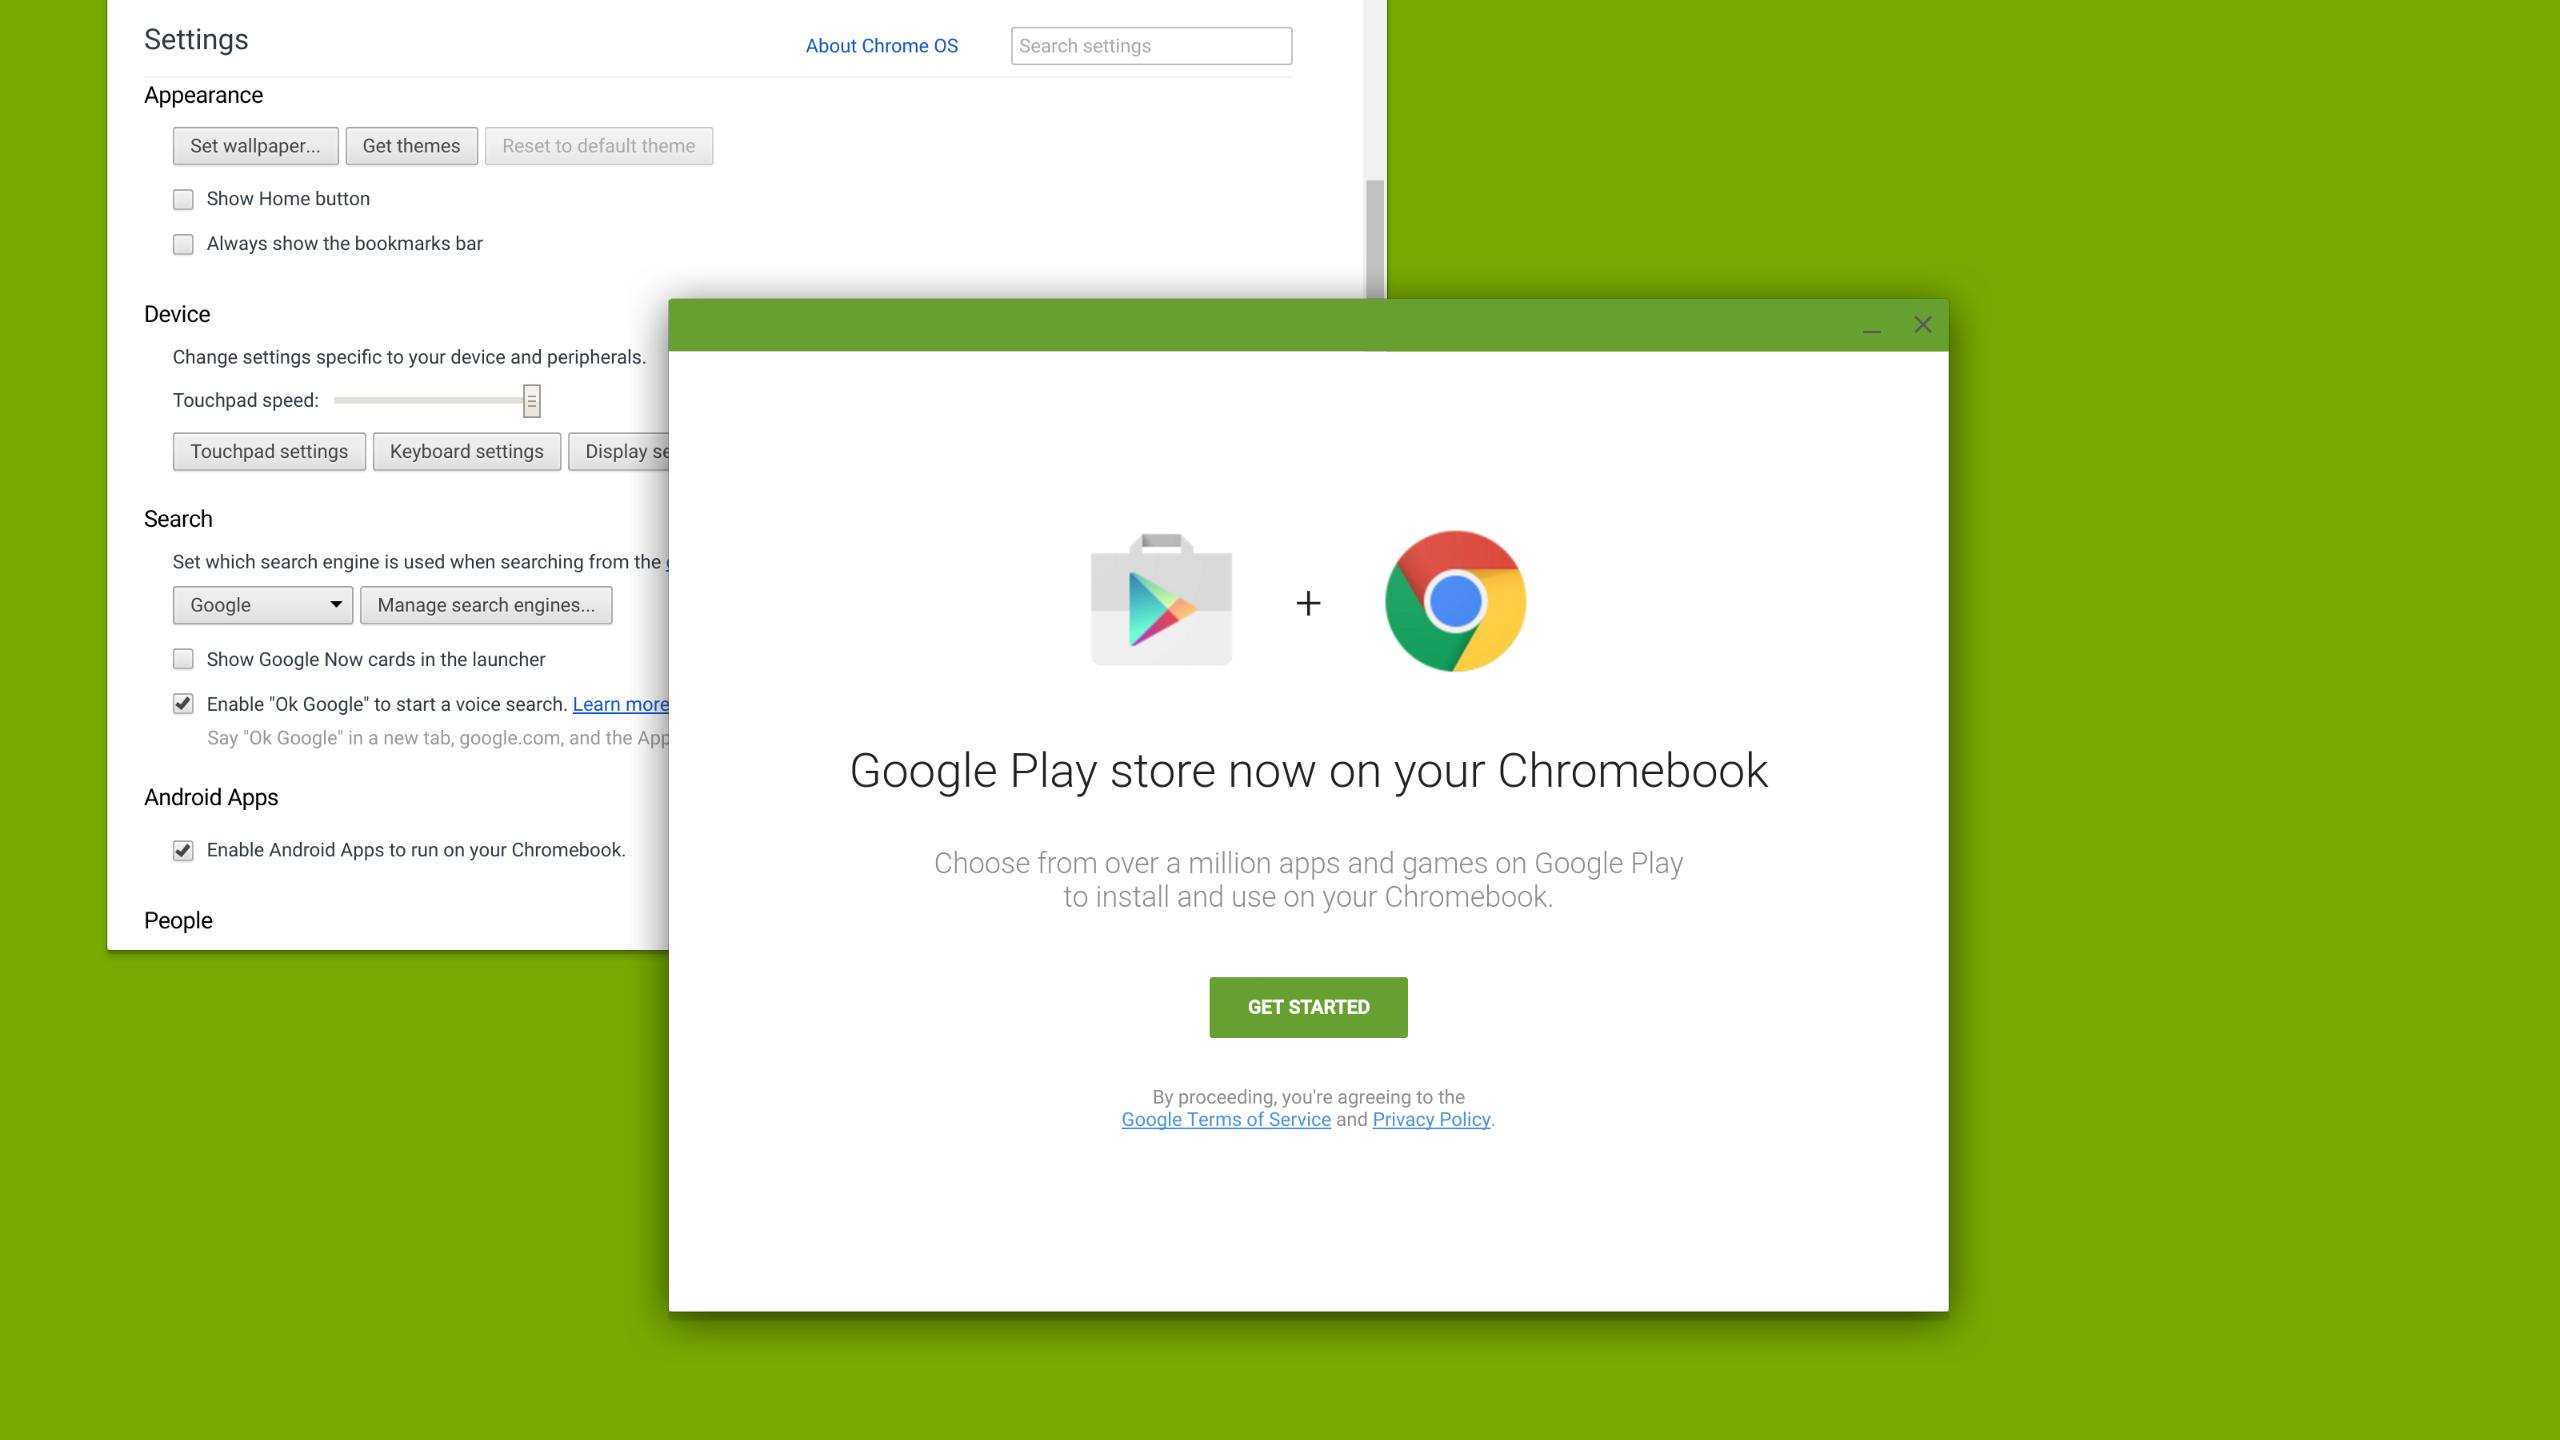 Google Play on Chromebook. Amazing.